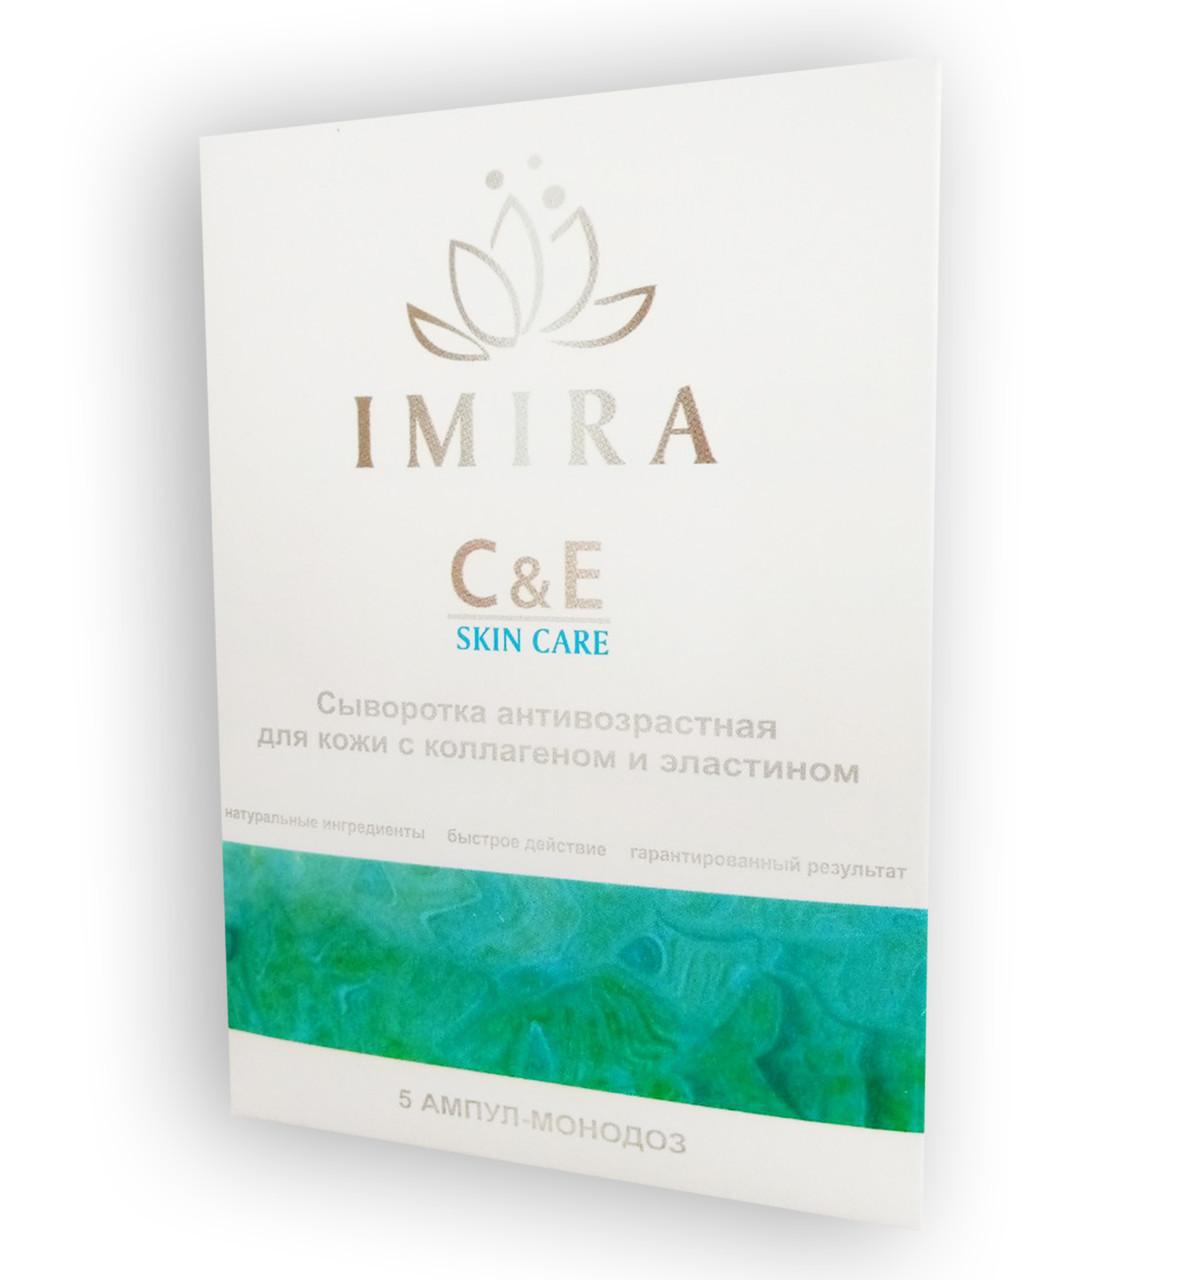 Imira C&E Омолаживающая сыворотка от морщин Имира  19430